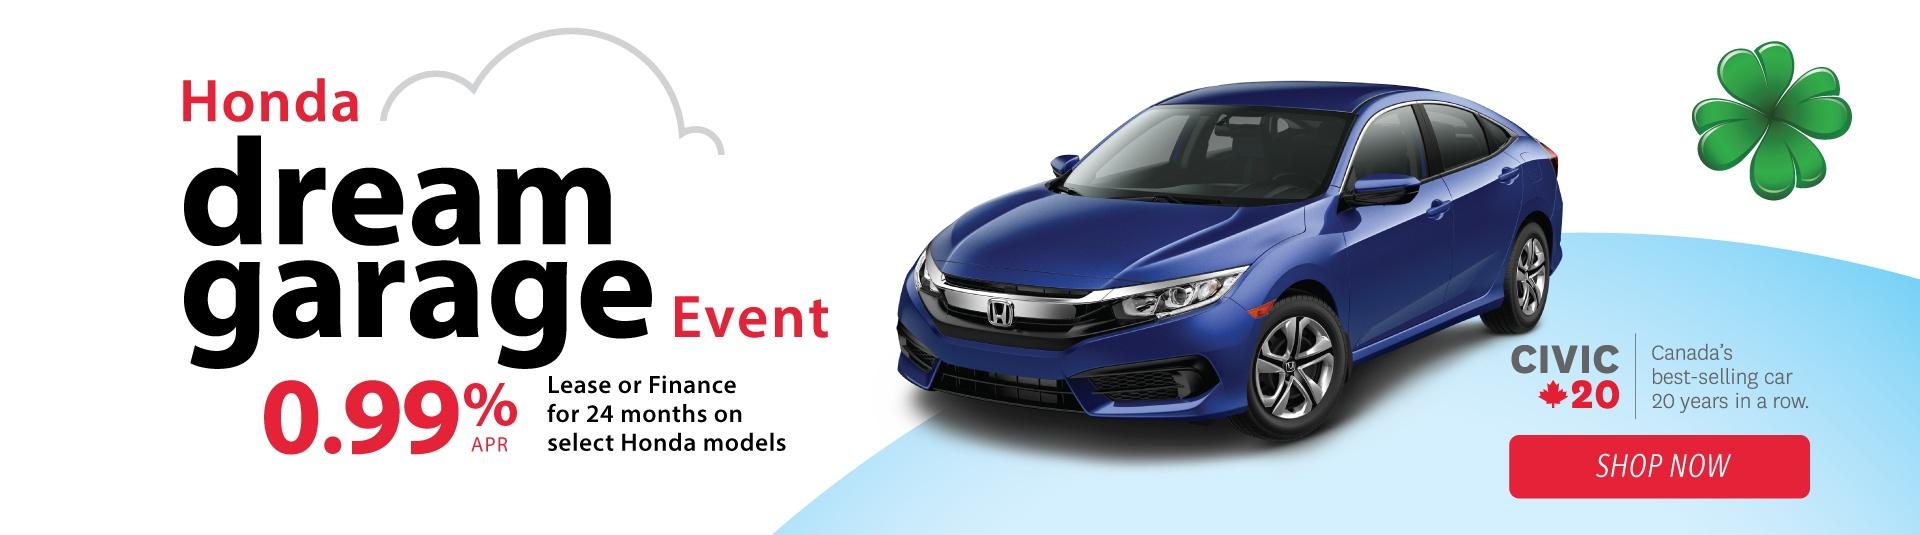 2018 Honda Civic LX on Sale for Dream Garage Event